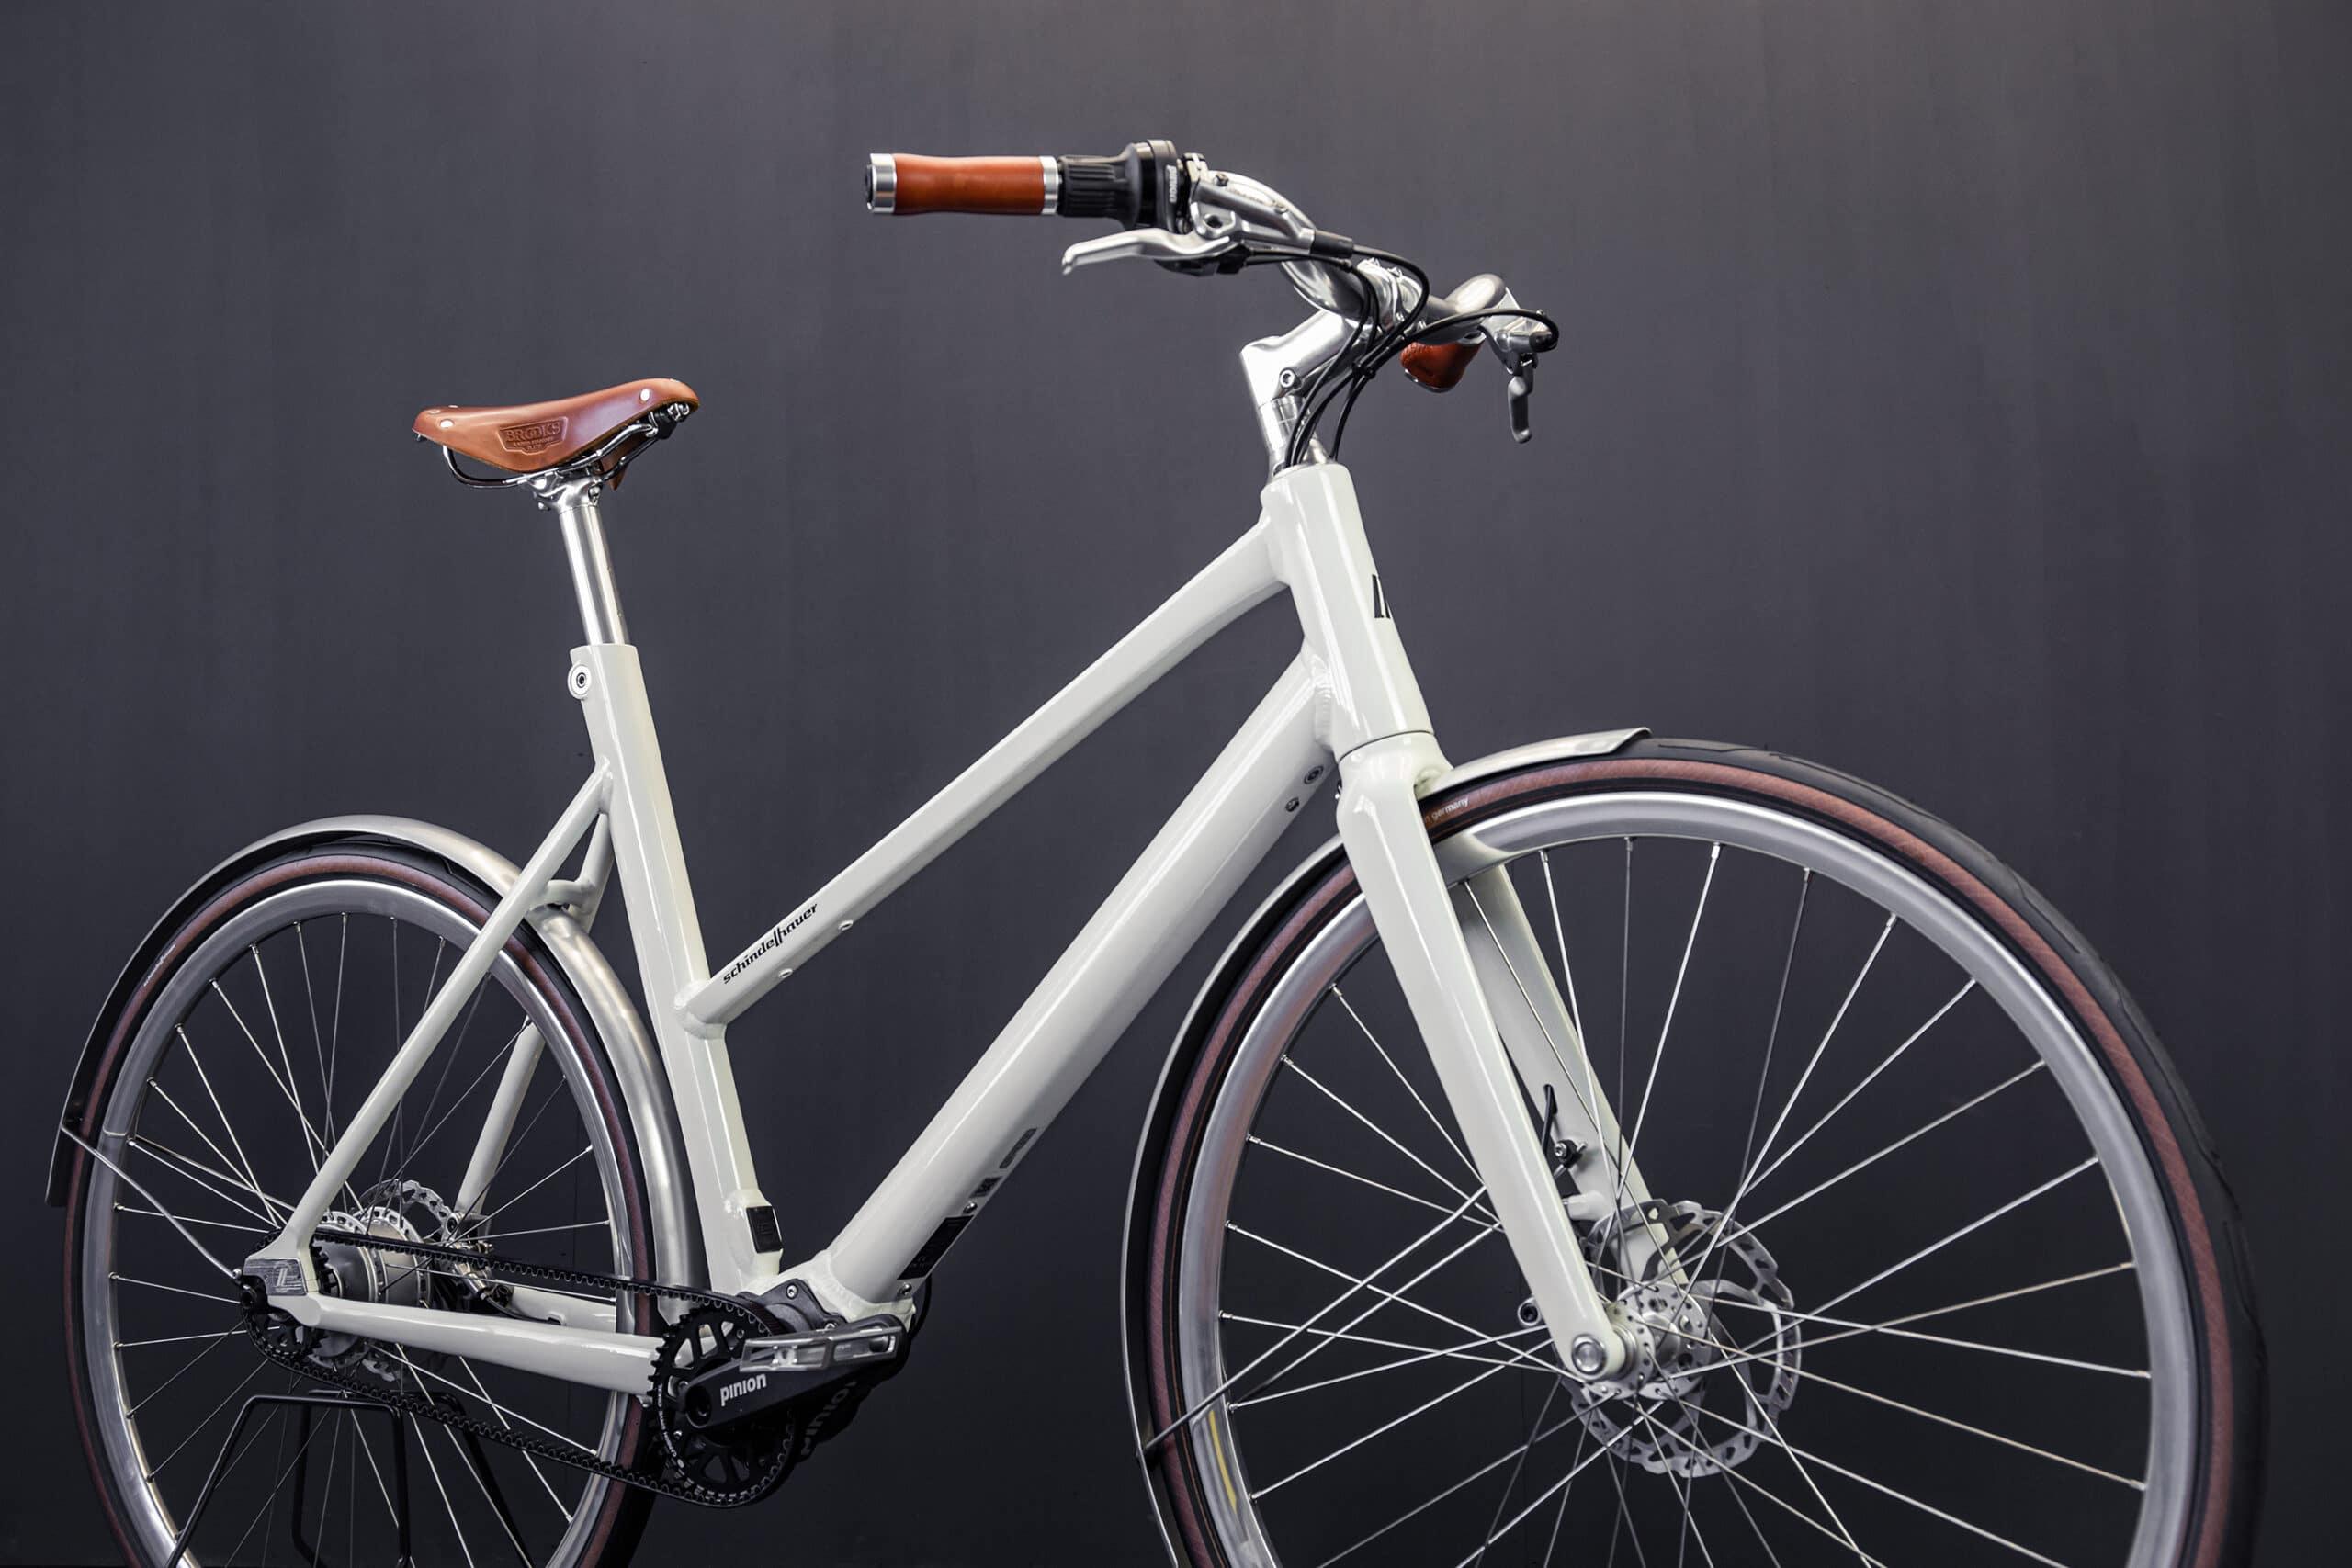 schindelhauer Antonia Pinion e-bike -3